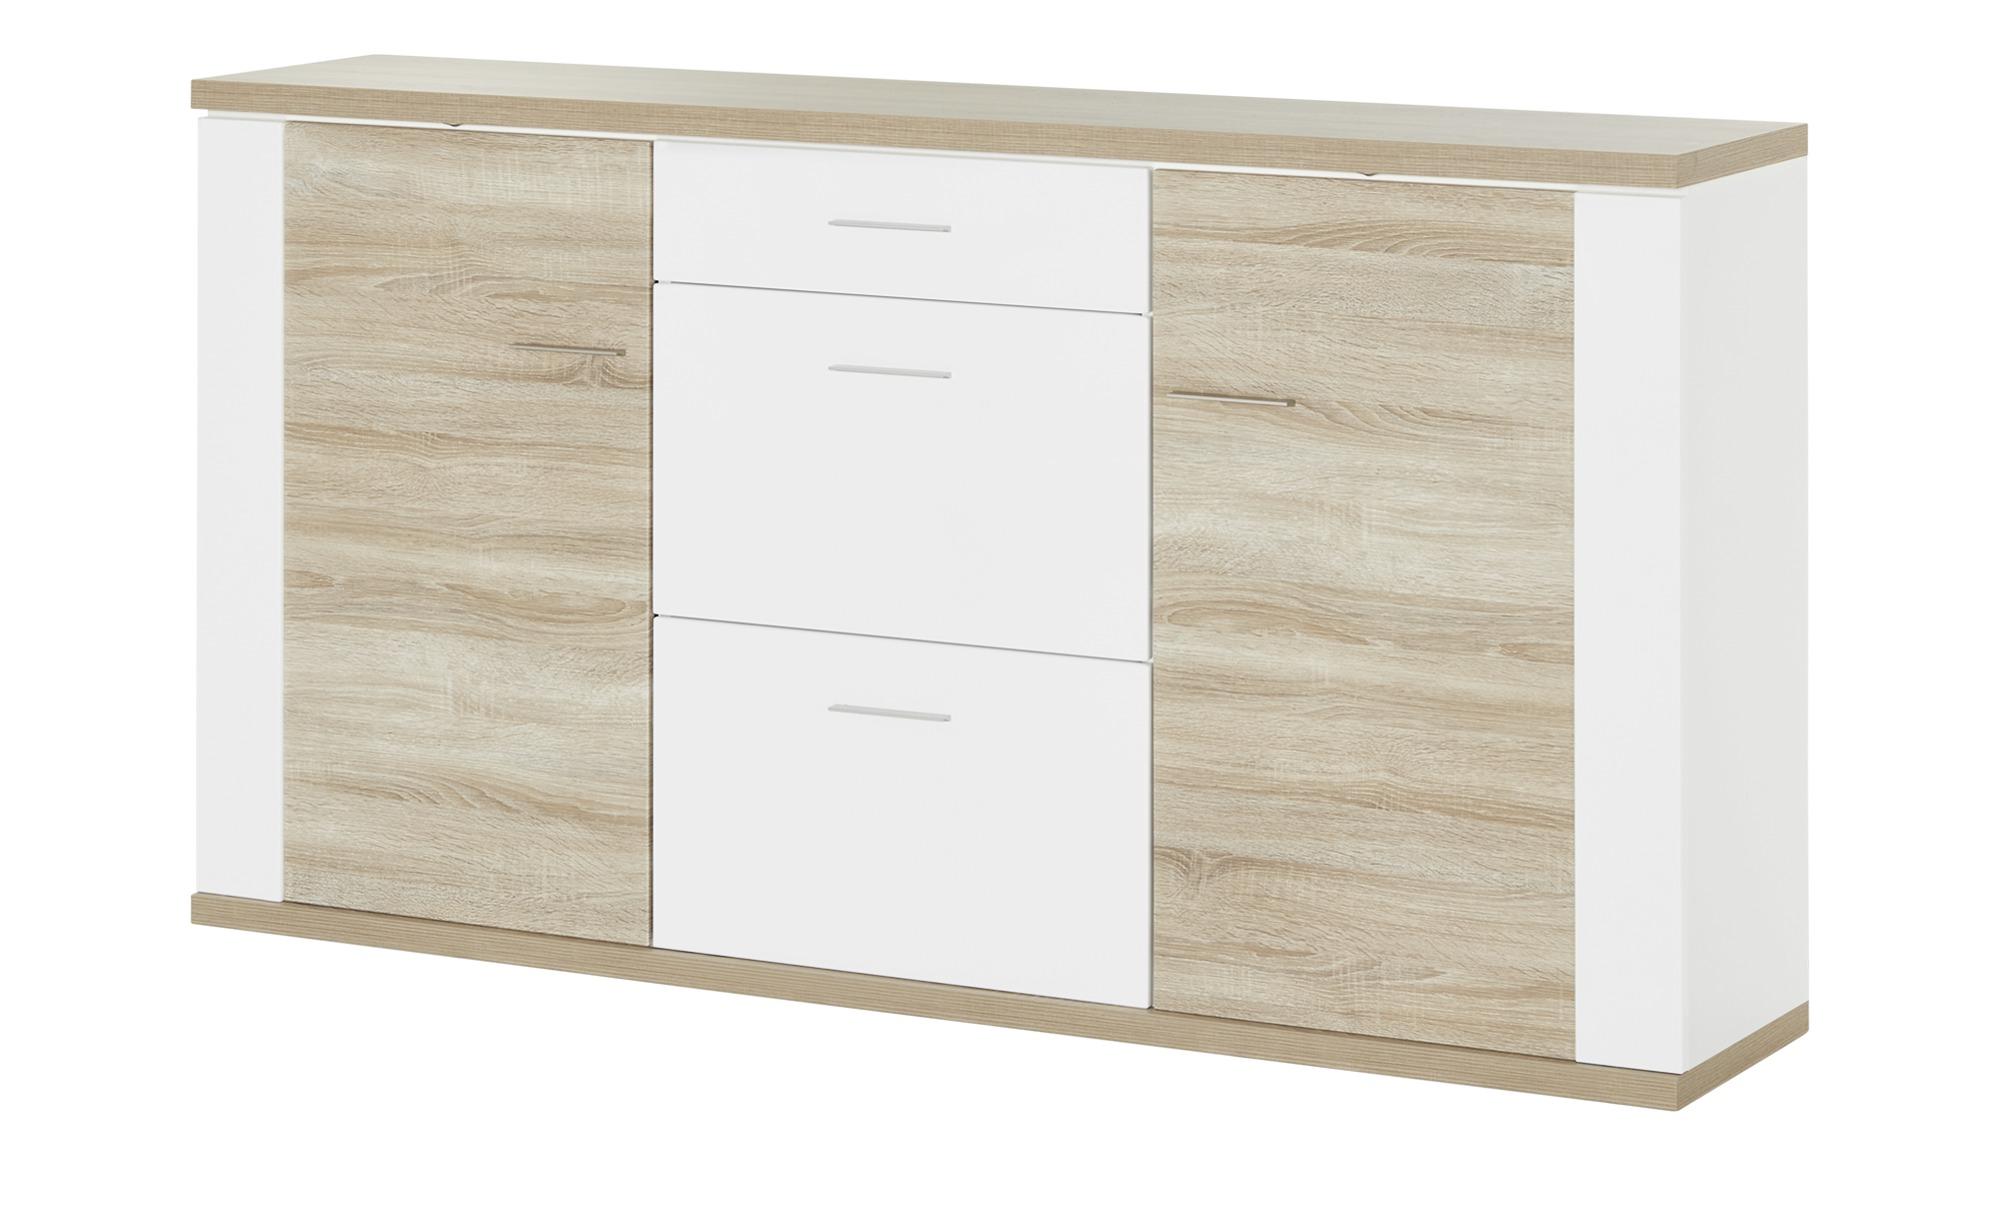 uno Sideboard   Titan ¦ Maße (cm): B: 194 H: 108 T: 42 Kommoden & Sideboards > Sideboards - Höffner